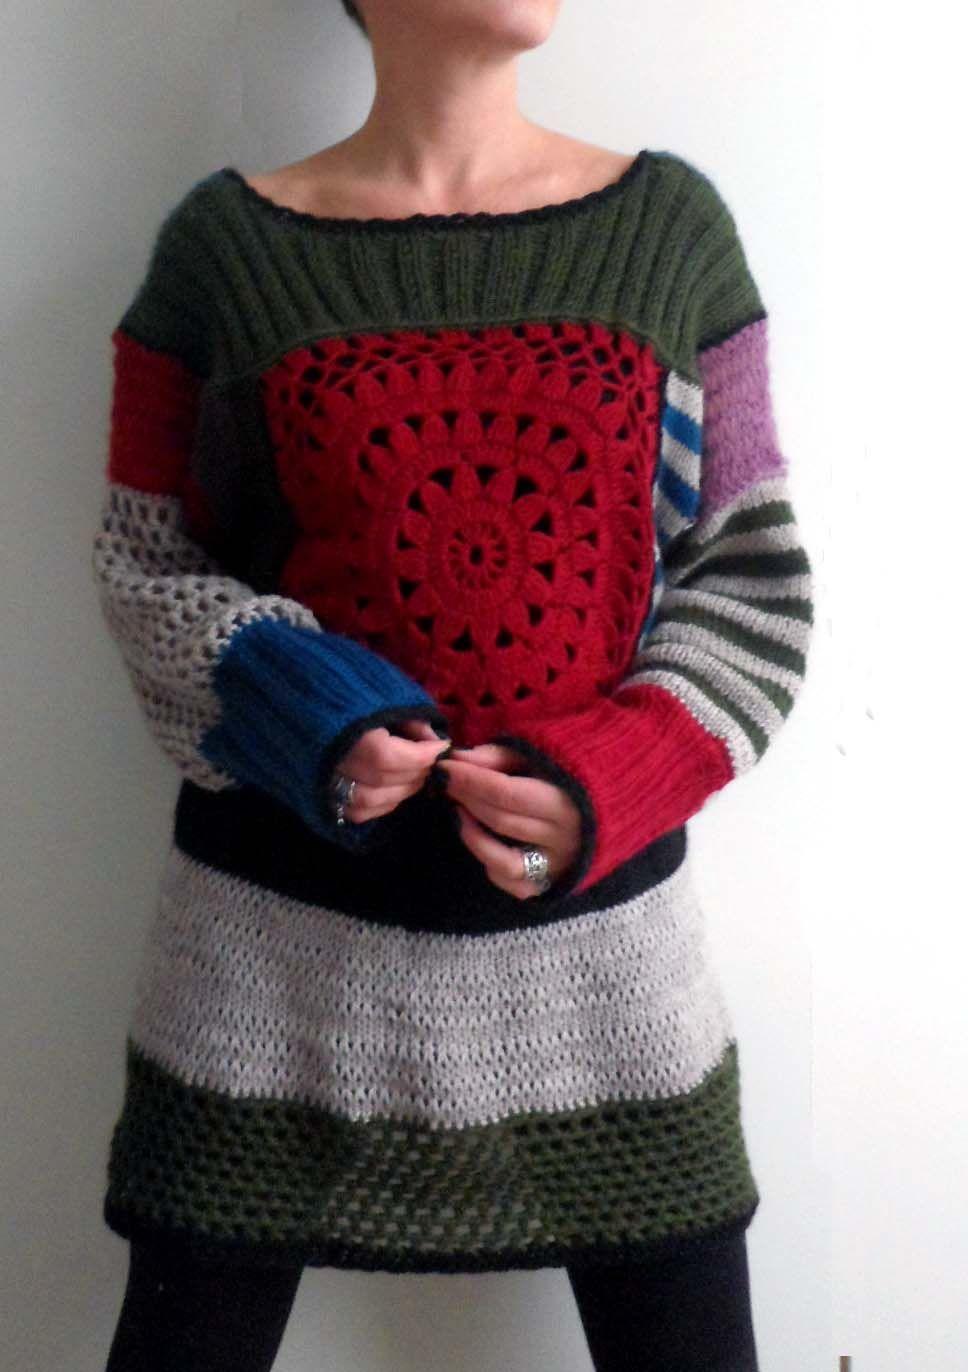 A cool sweater remake, probably with parts of old sweaters plus new crochet: https://lh6.googleusercontent.com/-6H00If08Ep0/TXsU84nvAaI/AAAAAAAACiQ/pT6-zJ56Grw/s1600/j%25C3%25A4m%25C3%25A4langat+020.jpg